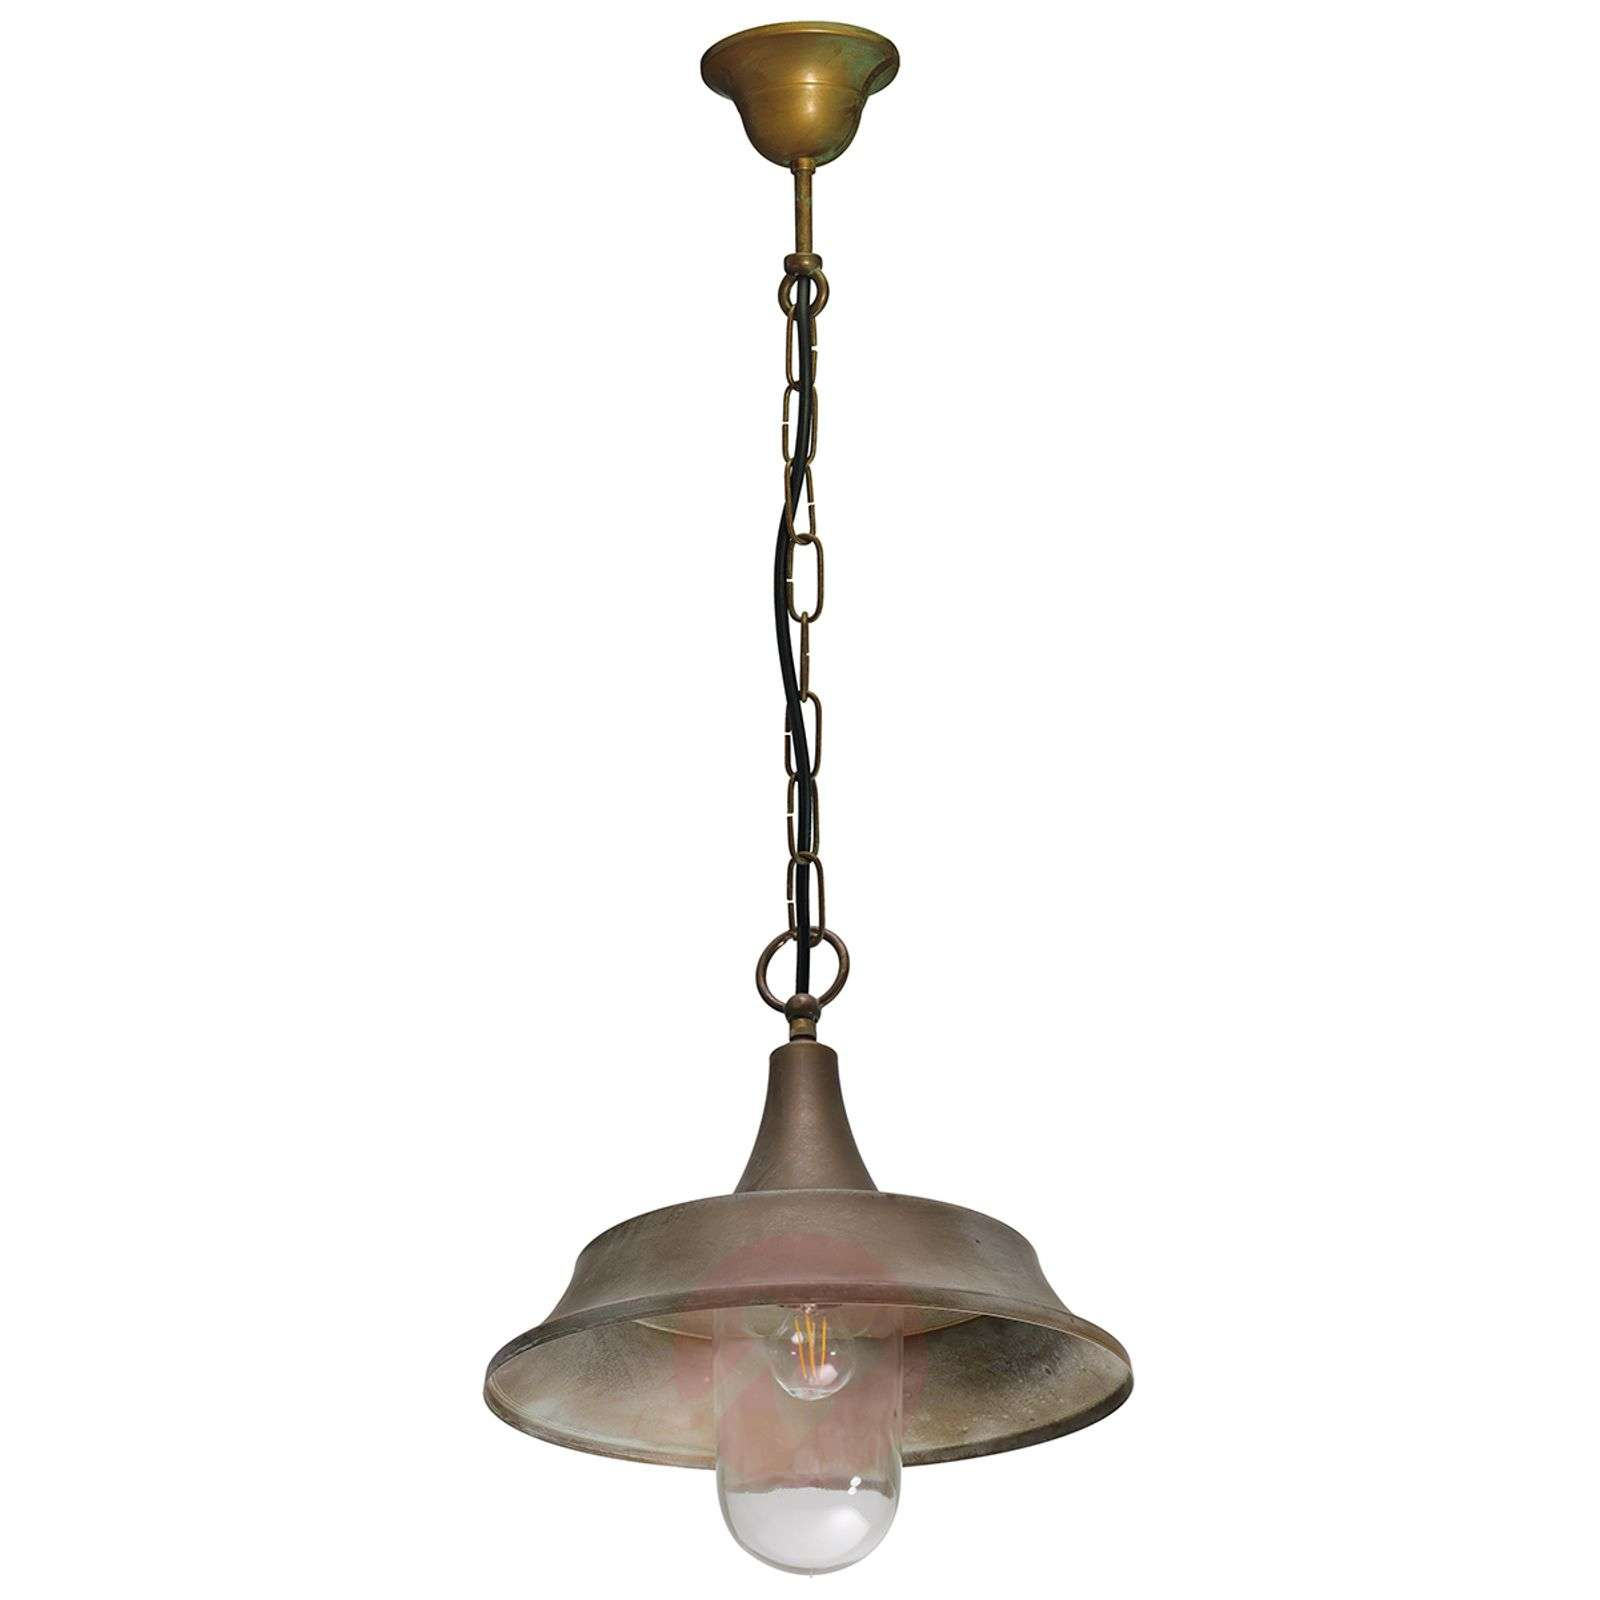 Ernesto seawater-resistant hanging light-6515347-01